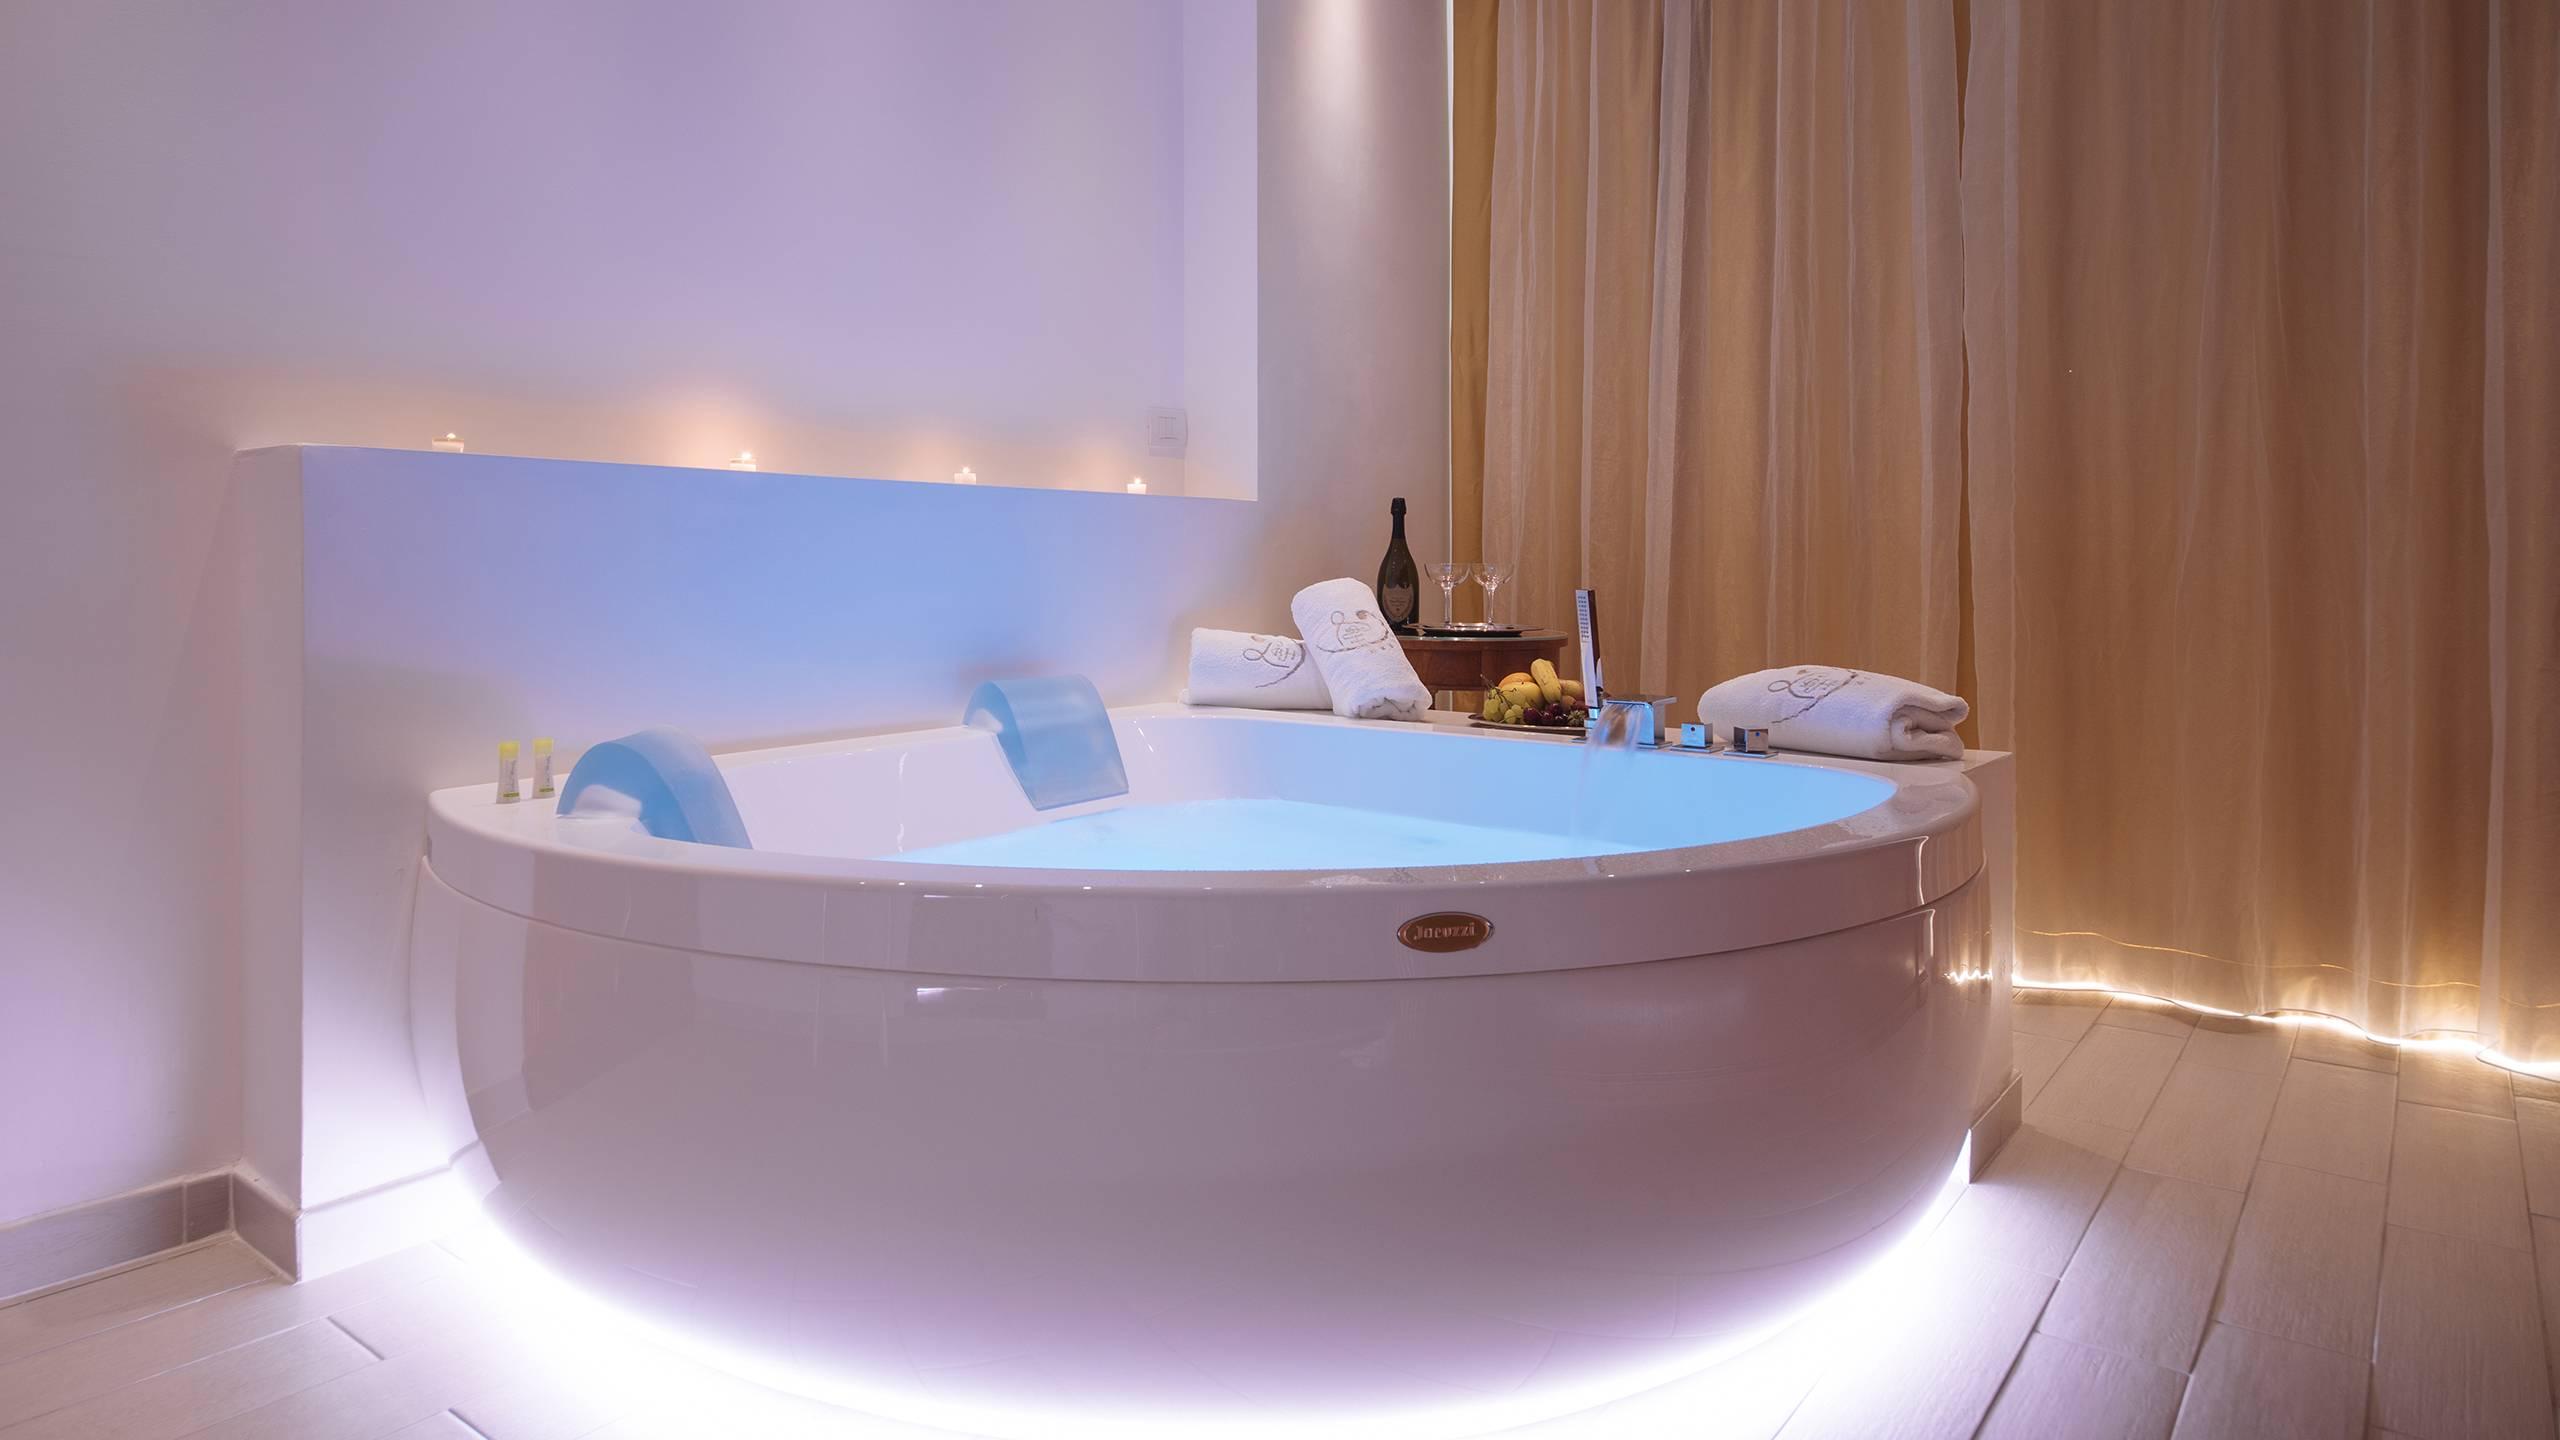 Ludwig-Boutique-Hotel-Bolsena-детали-ванну-джакузи-1-3